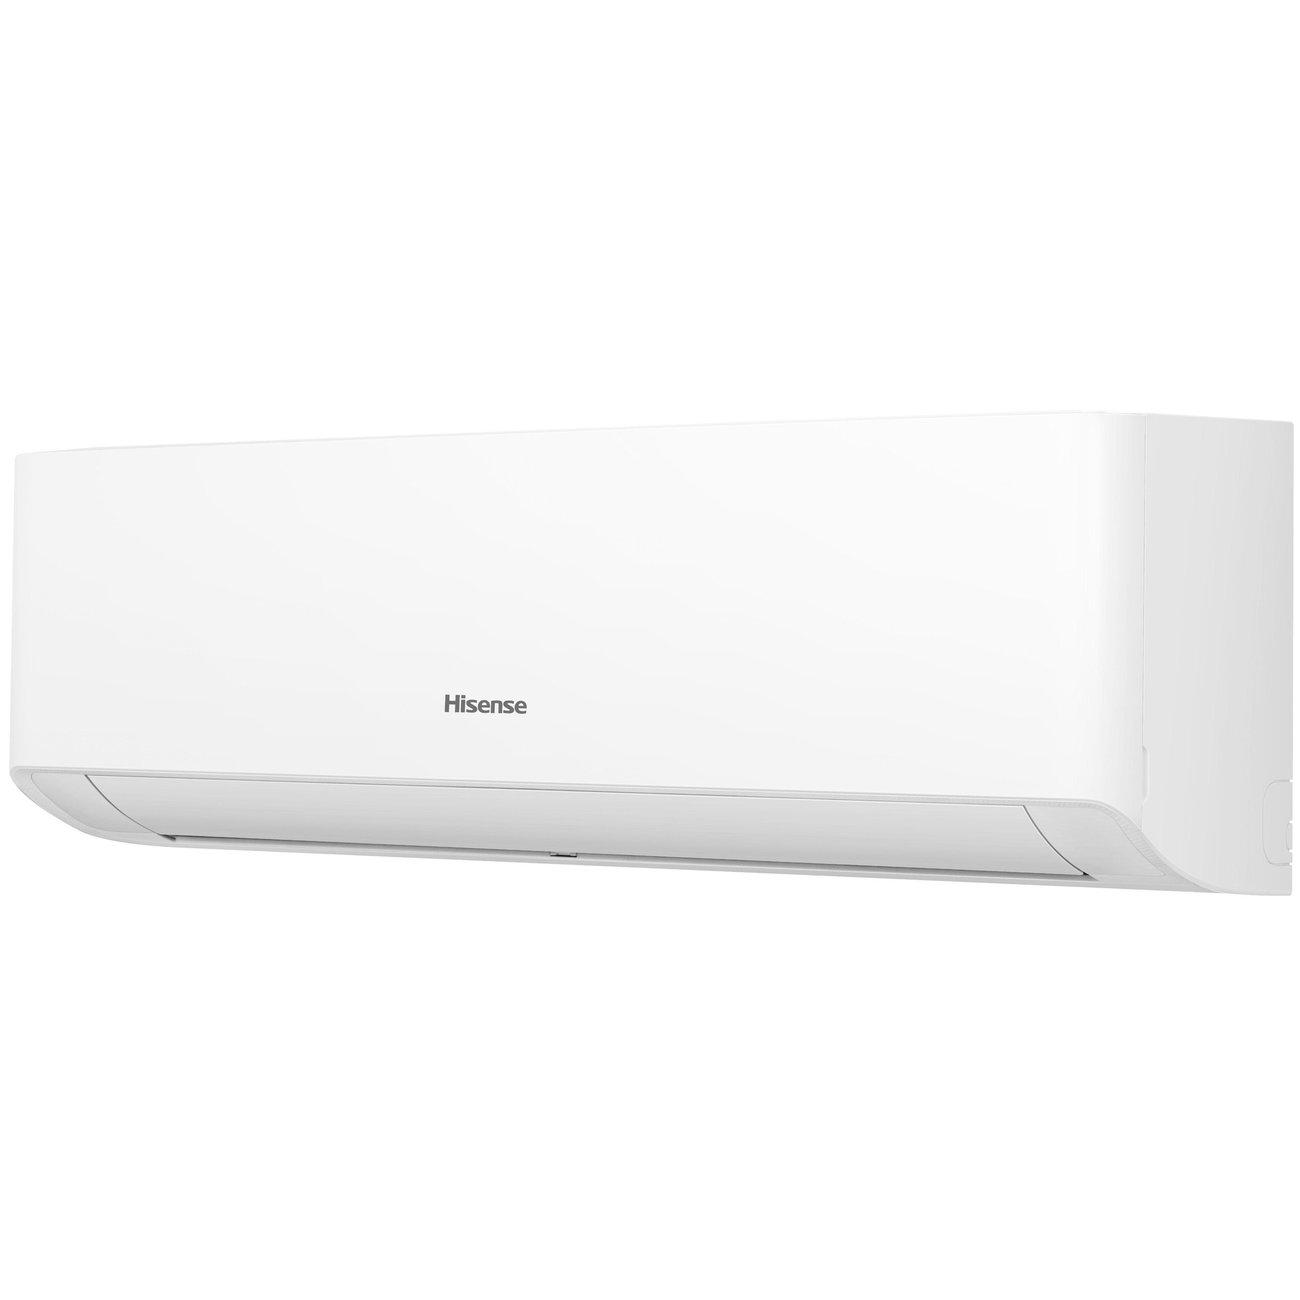 Климатик Hisense KA50BS0EG / KA50BS0EW , 18000 охл/отопление BTU, A++